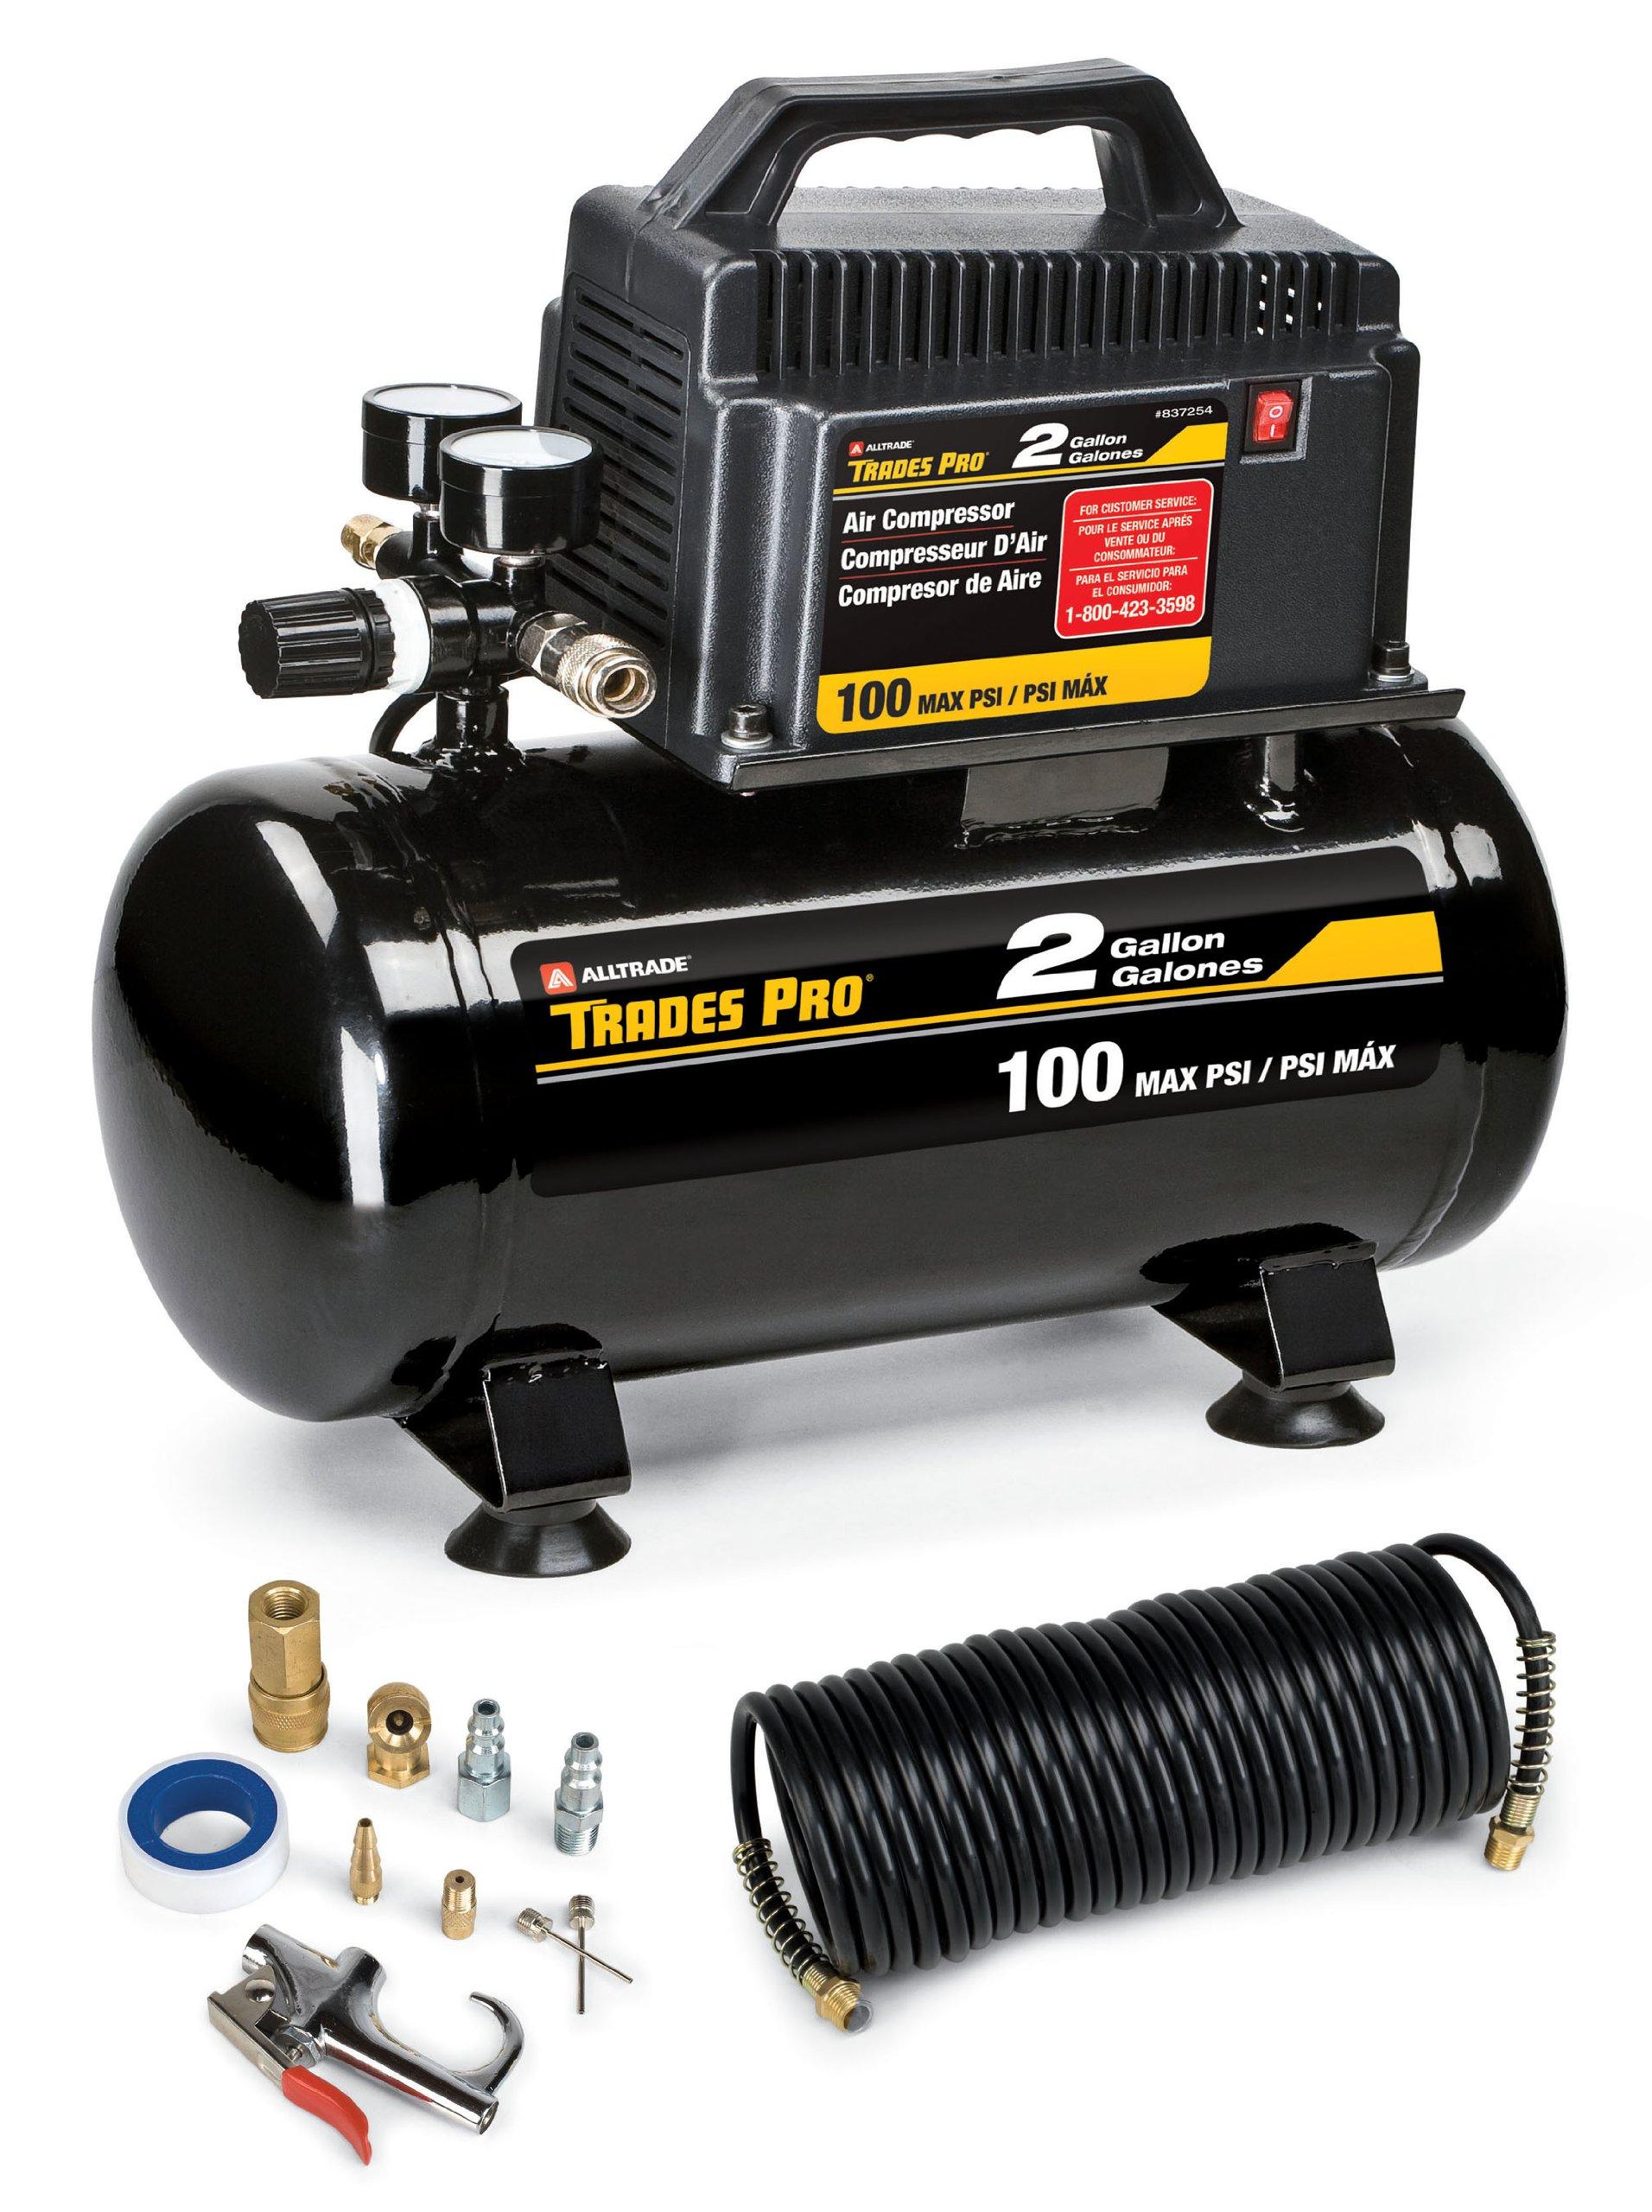 837254 2 Gal Air Compressor w/11Pc AC by Alltrade